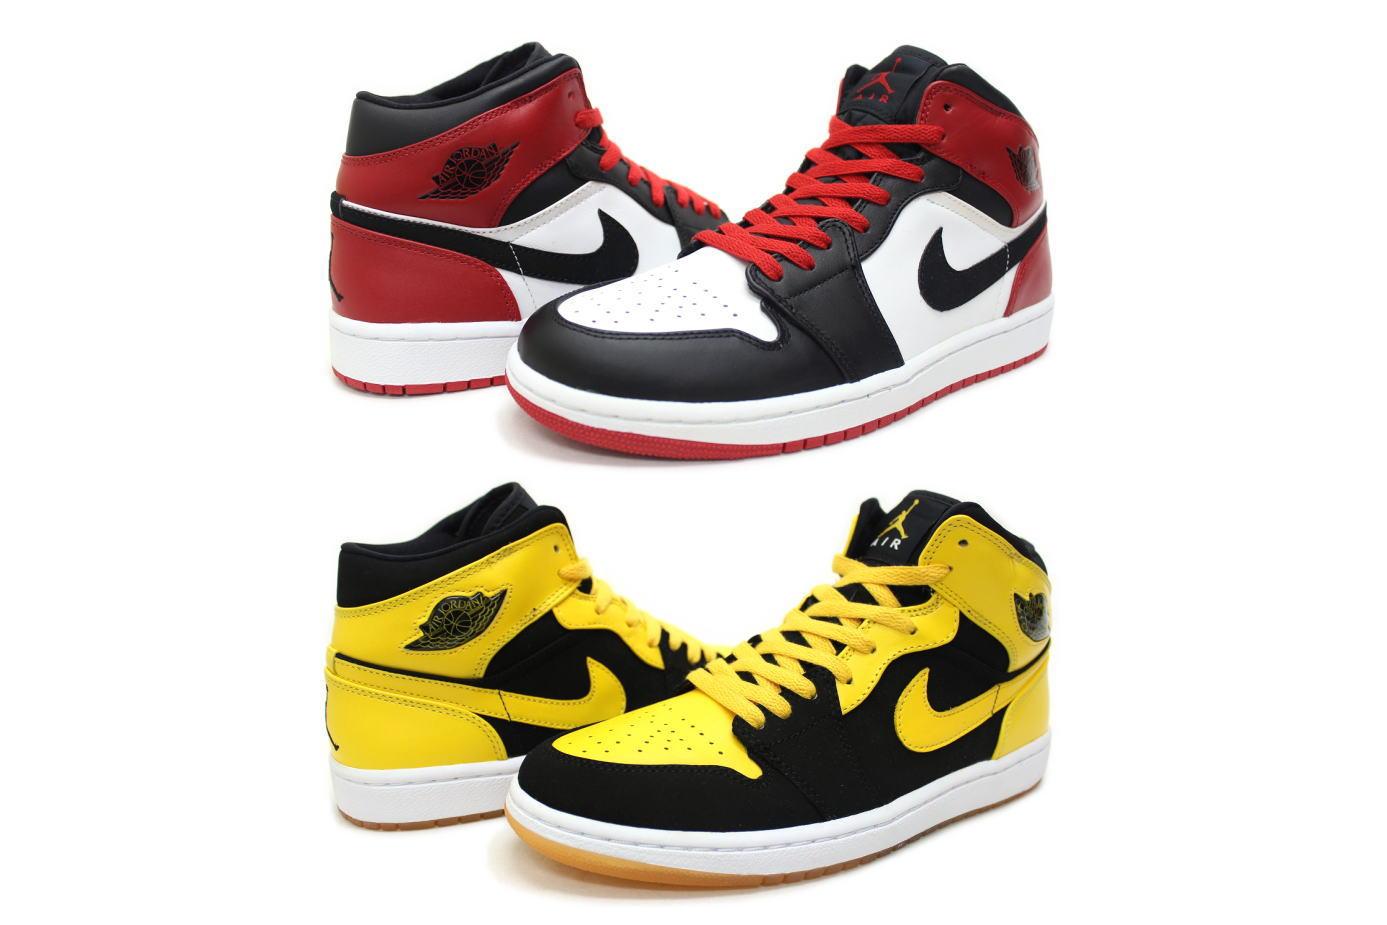 09afcf3b1cc7 NIKE JORDAN OLD LOVE NEW LOVE BMP PACK two-legged set 316132-991 Nike Air  Jordan 1 retro old love new love beginning moments Pack stumbled black  yellow ...